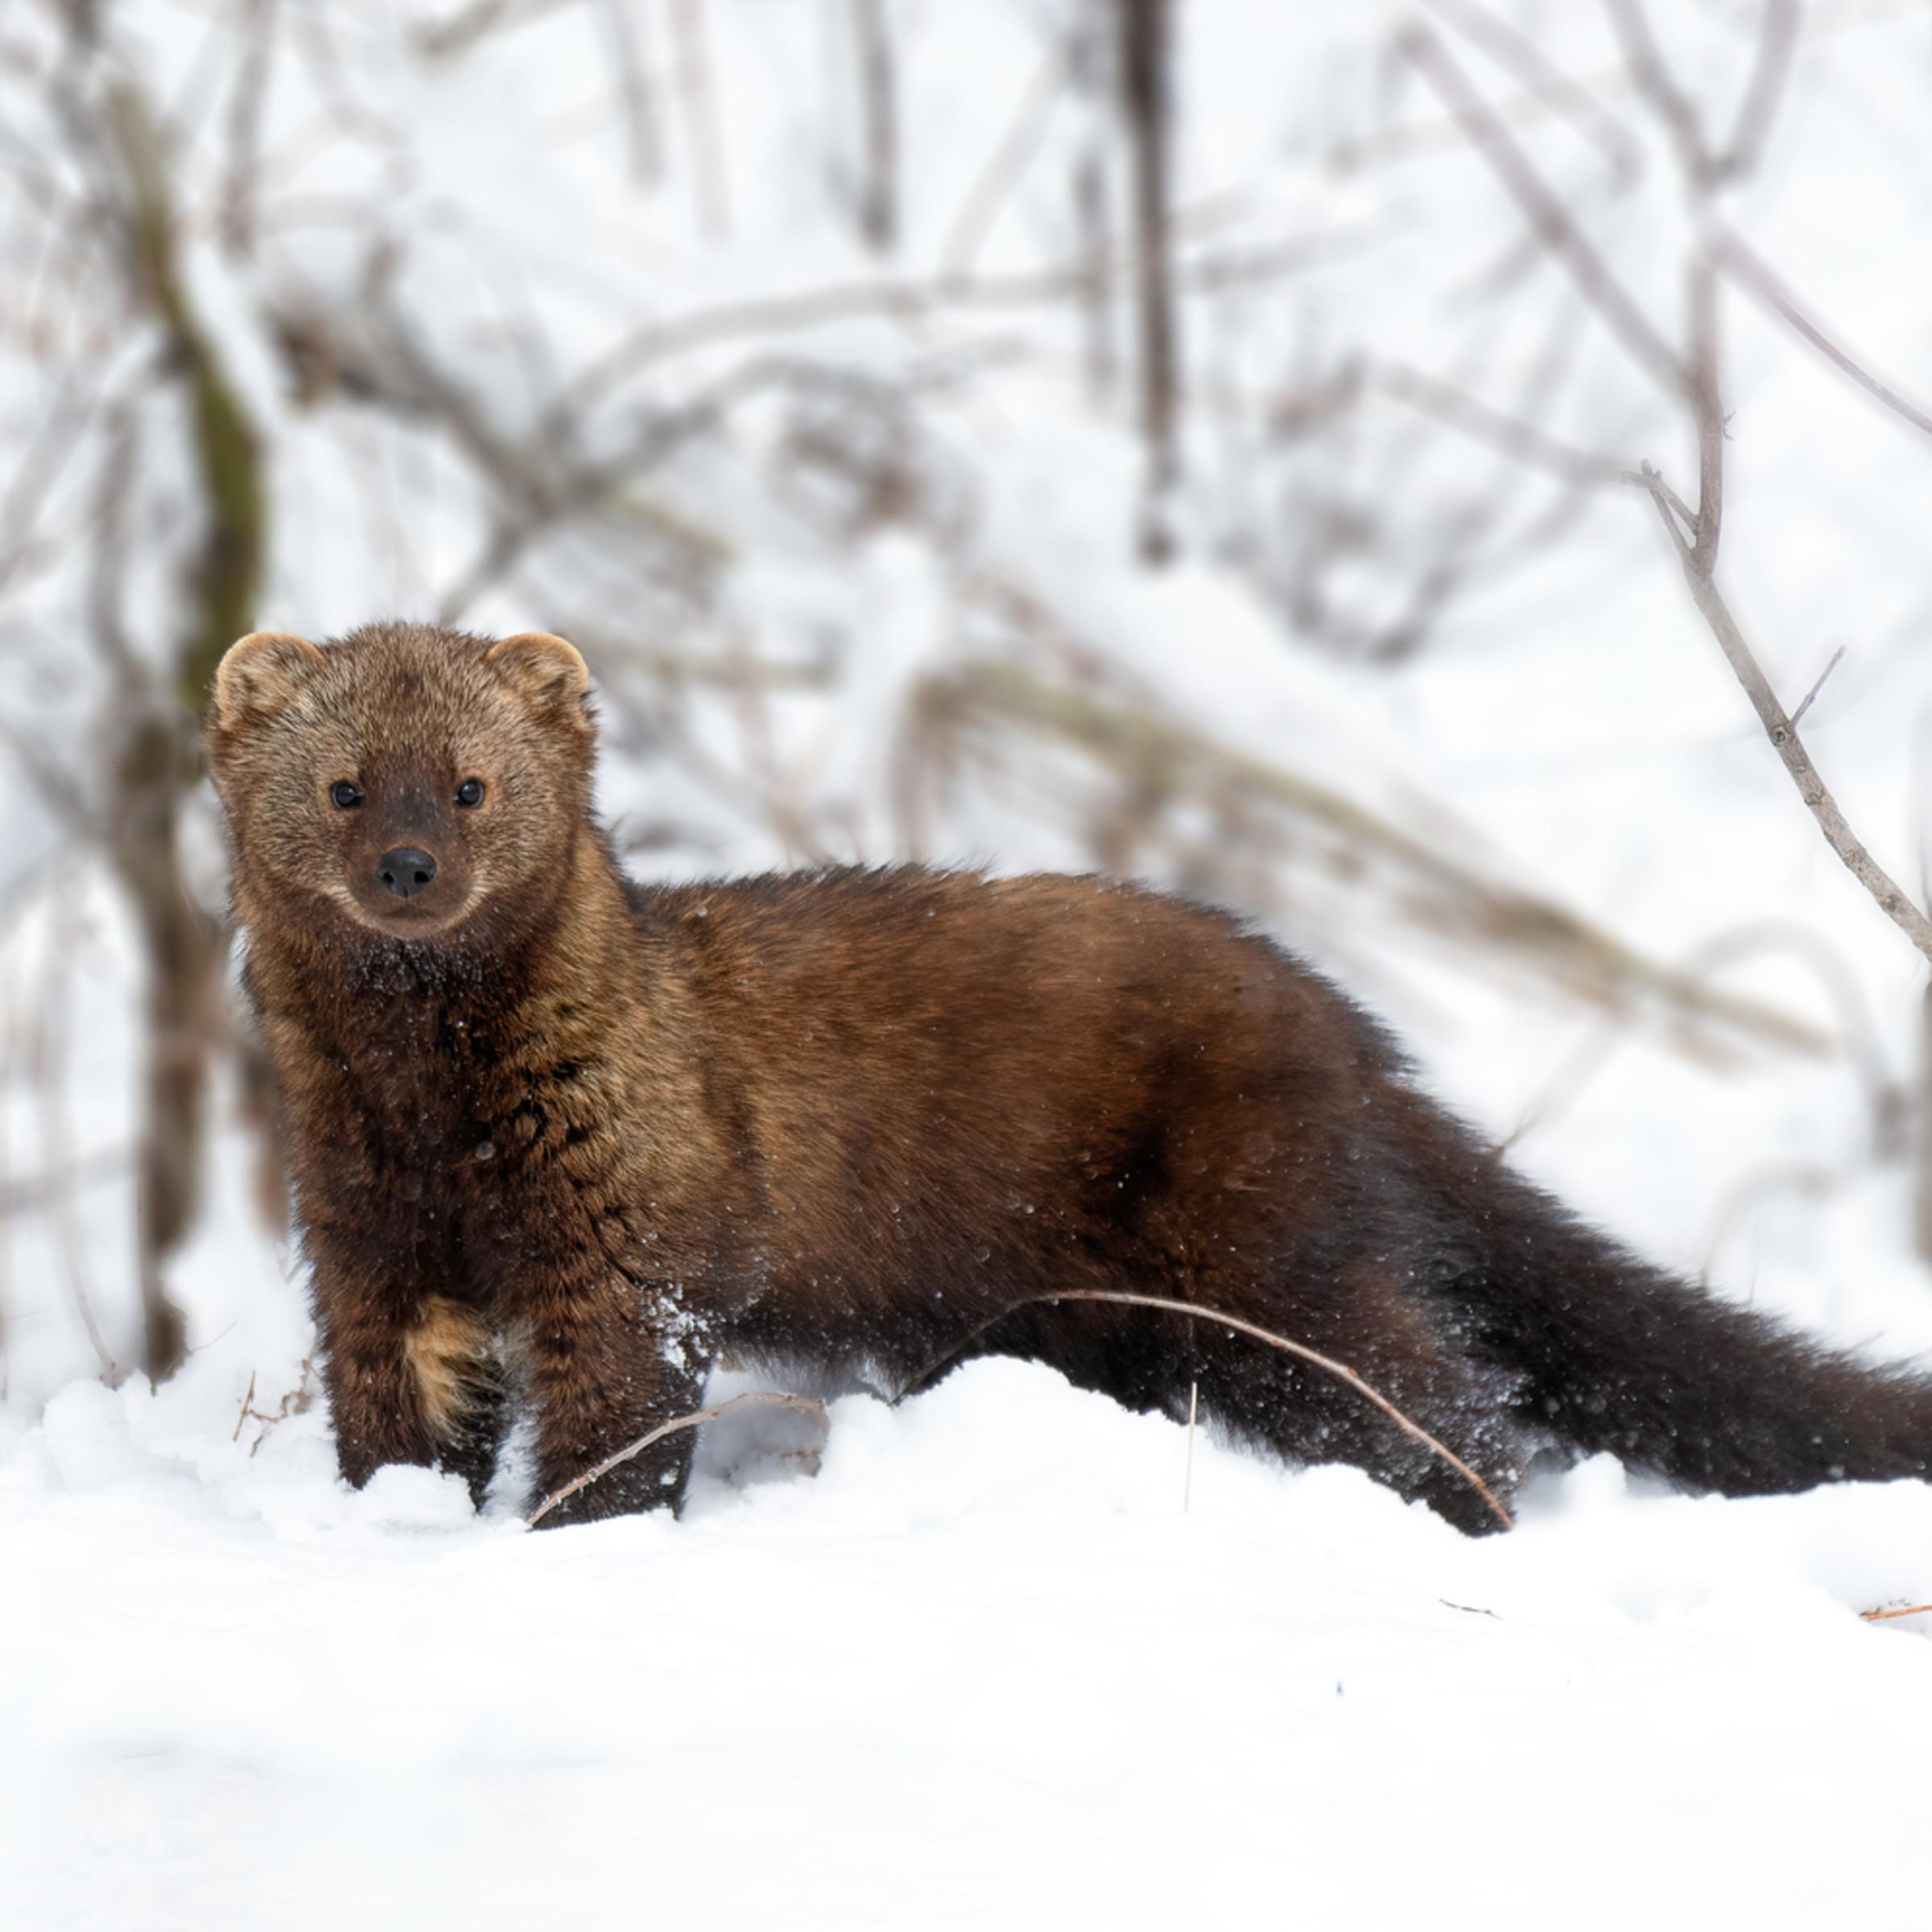 Fisher in snow u8meg9